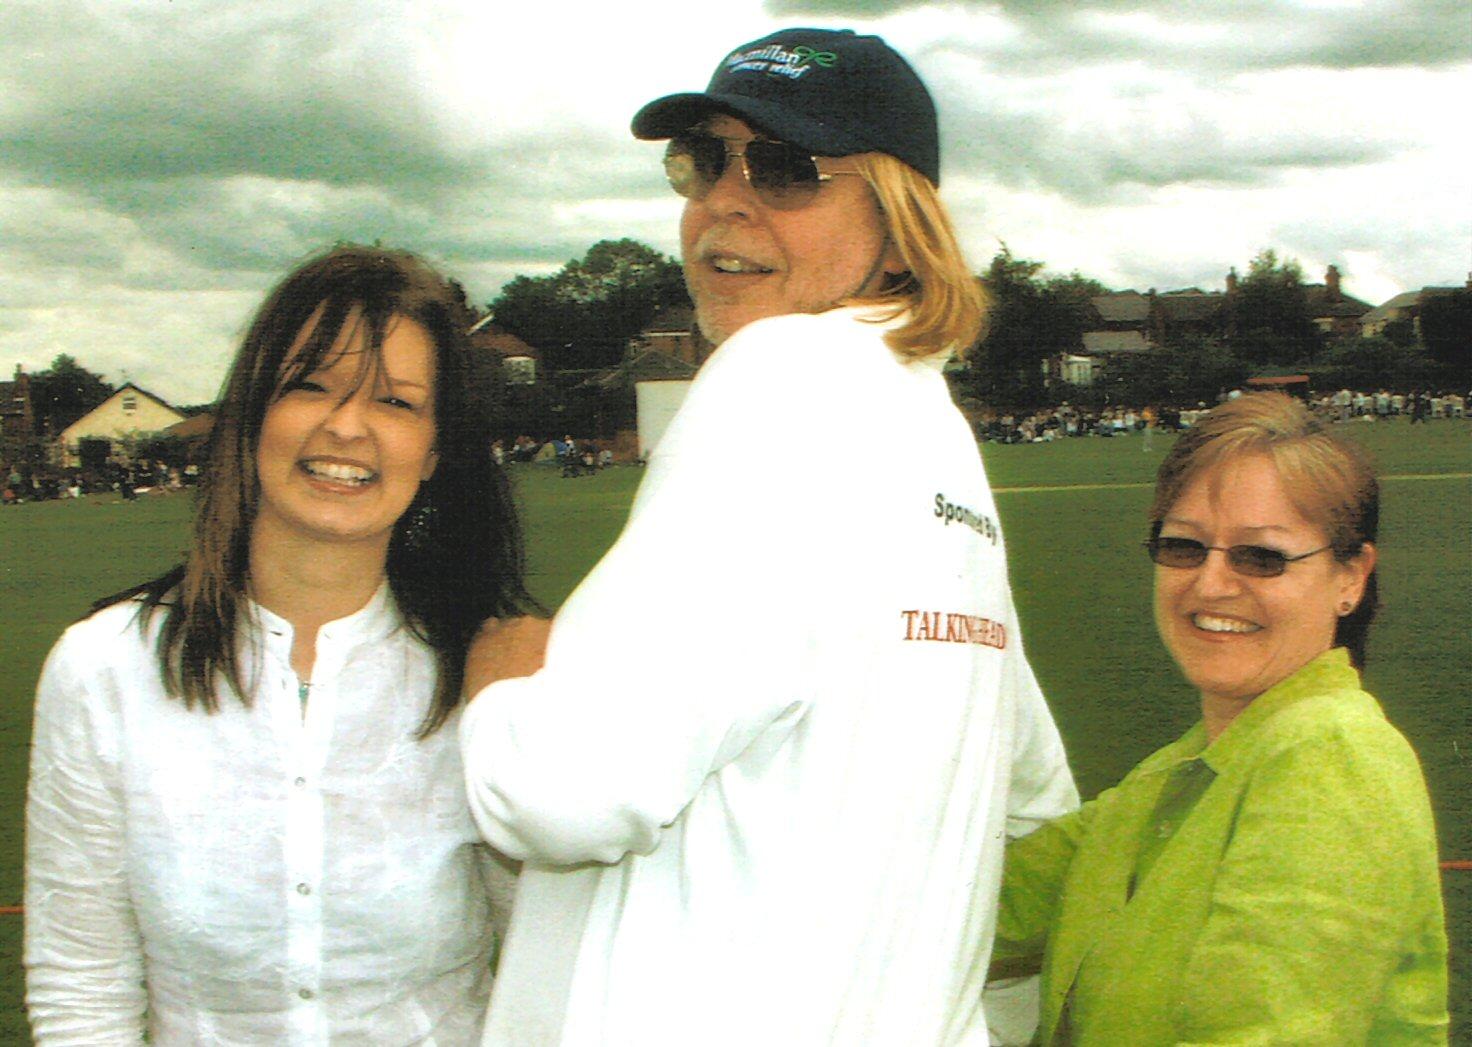 L-R: Laurianne, Rick Wakeman, Eileen.